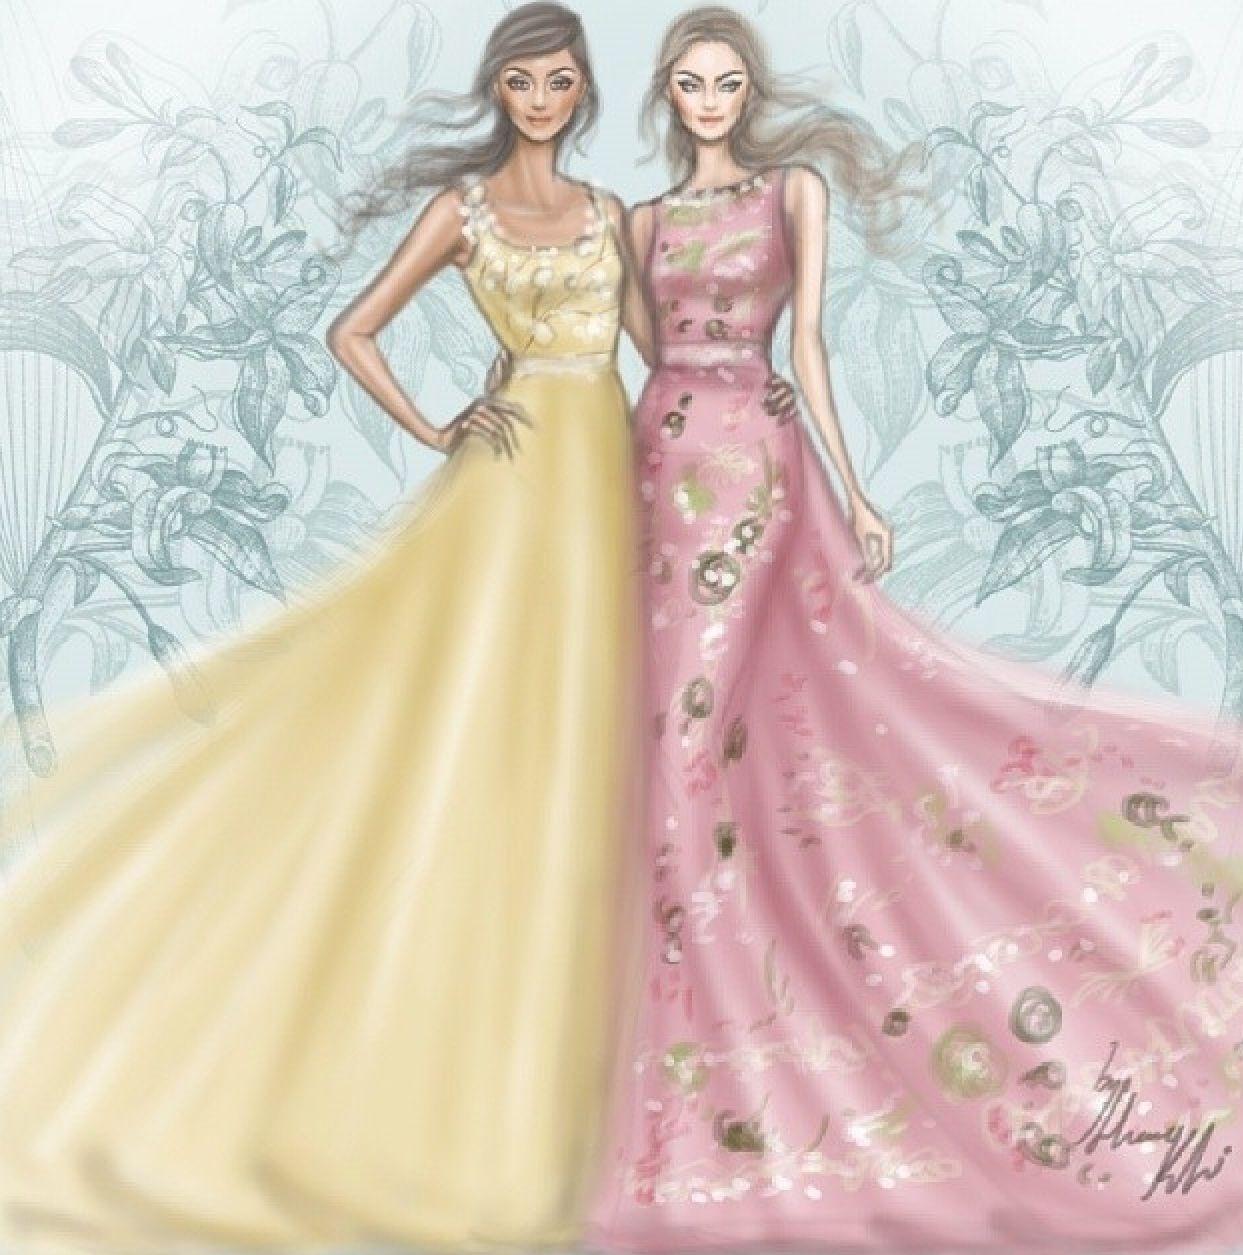 Shamekh Bluwi - Razana Lazzouni   moda Tasarım   Pinterest   Diseños ...